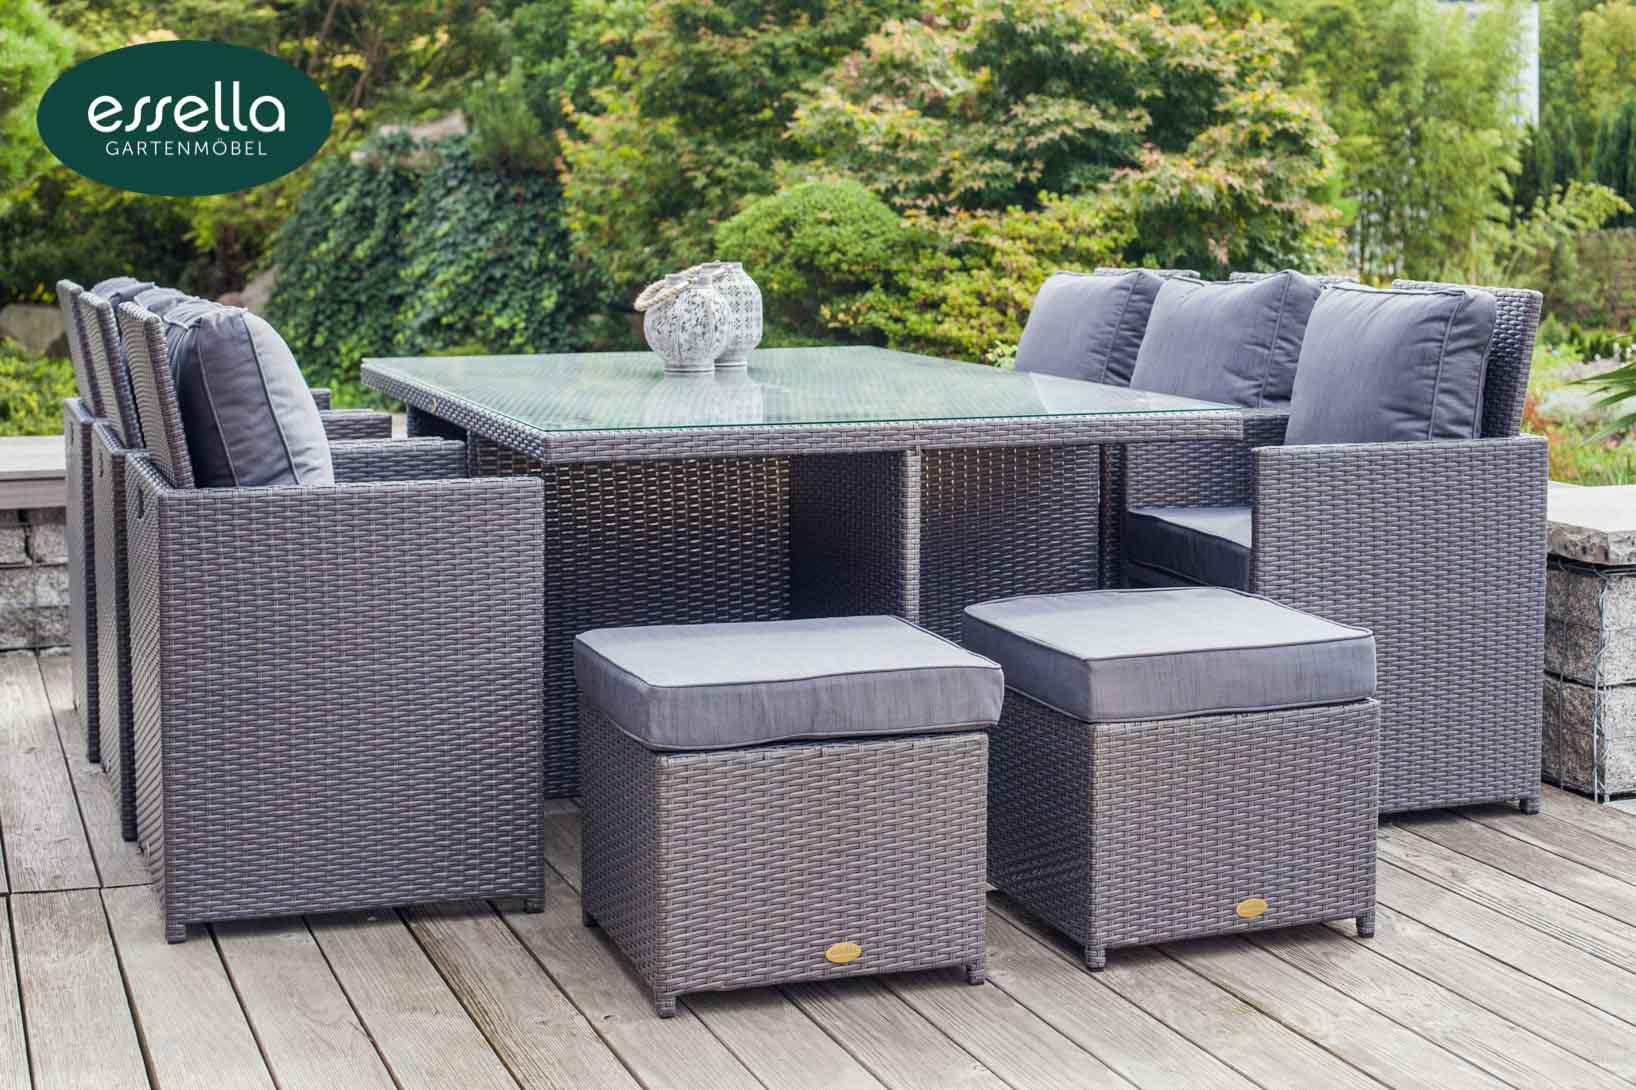 essella polyrattan sitzgruppe vienna 6 personen. Black Bedroom Furniture Sets. Home Design Ideas